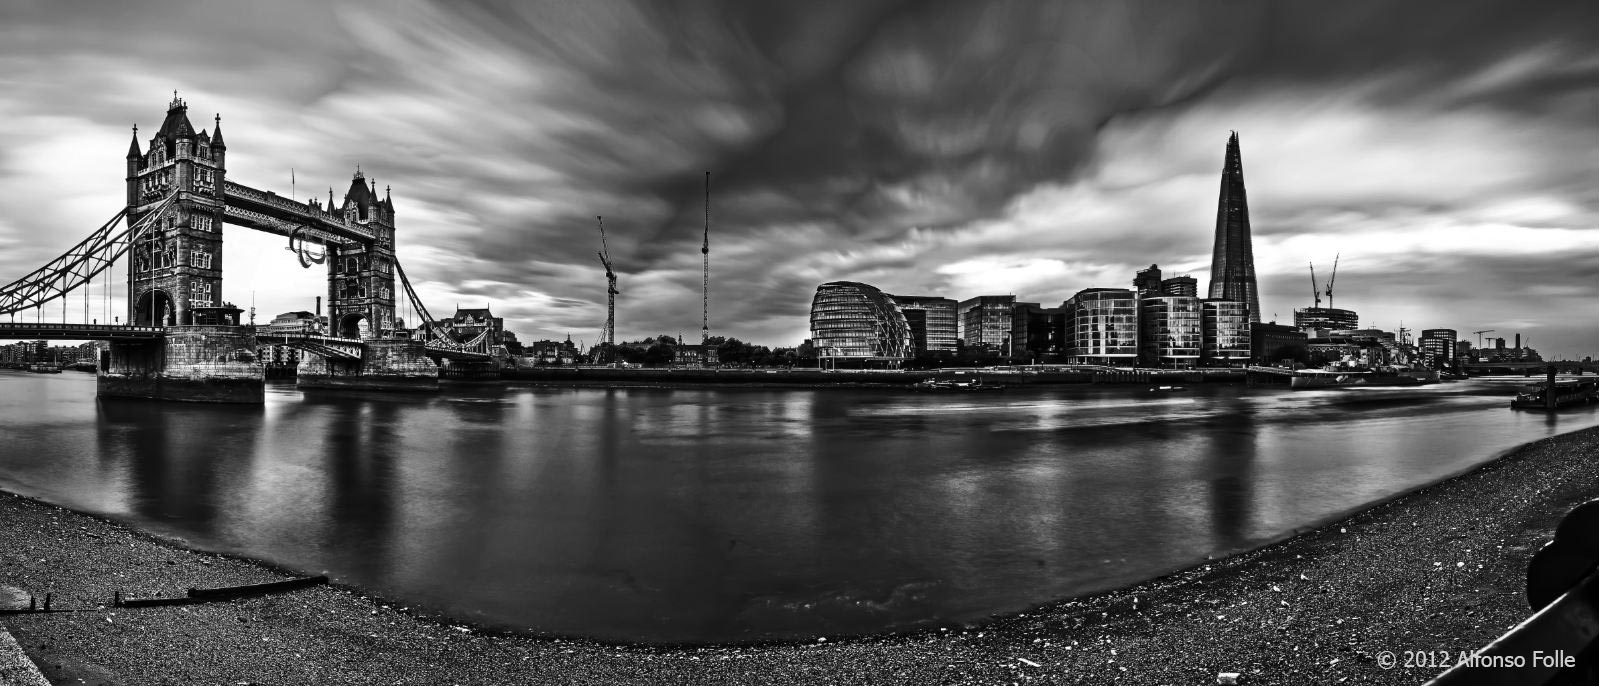 London, city of dreams